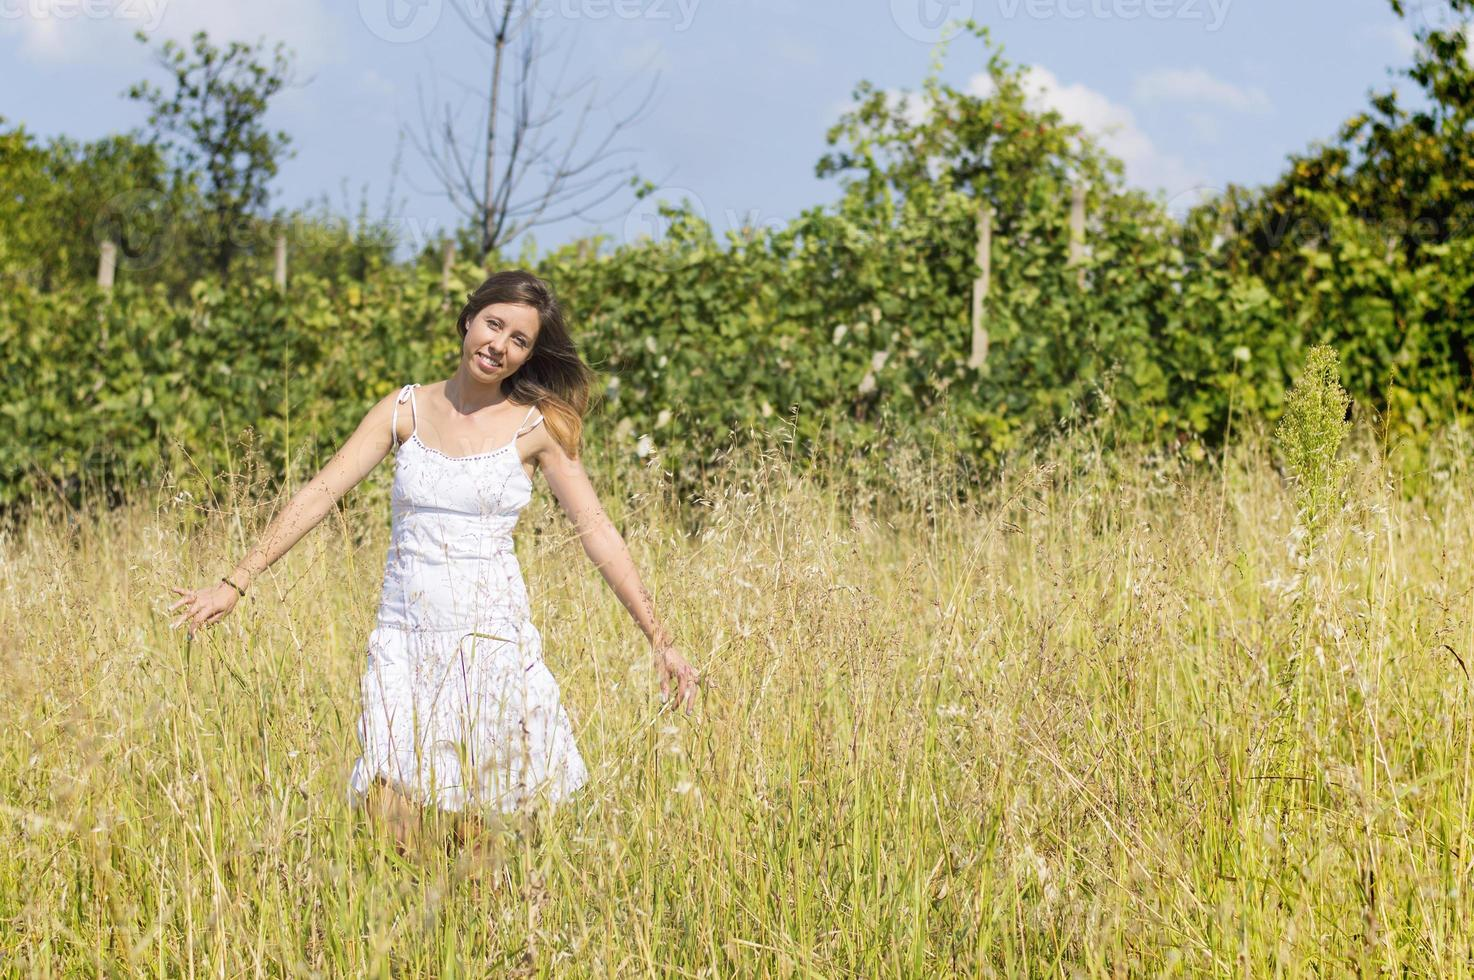 jeune femme, dans, champ, porter, robe blanche photo